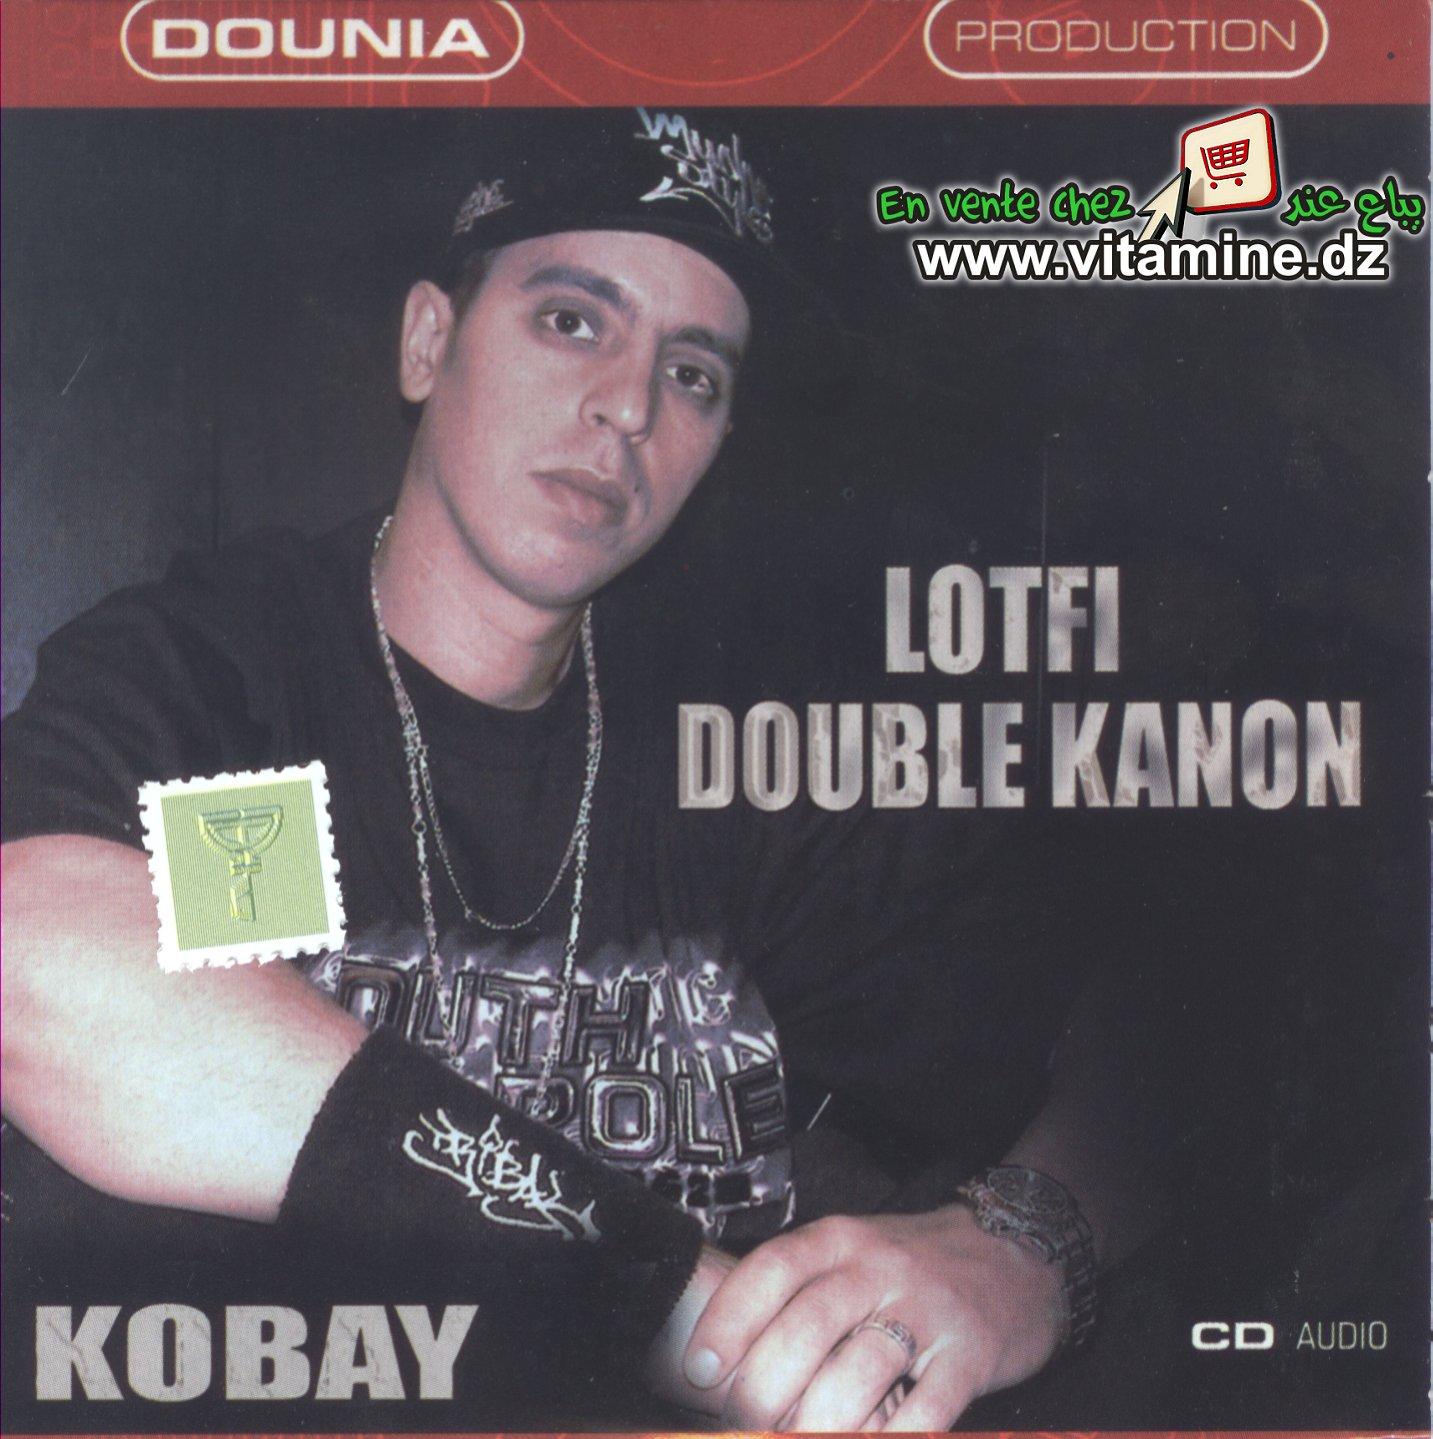 Double Kanon - kobay